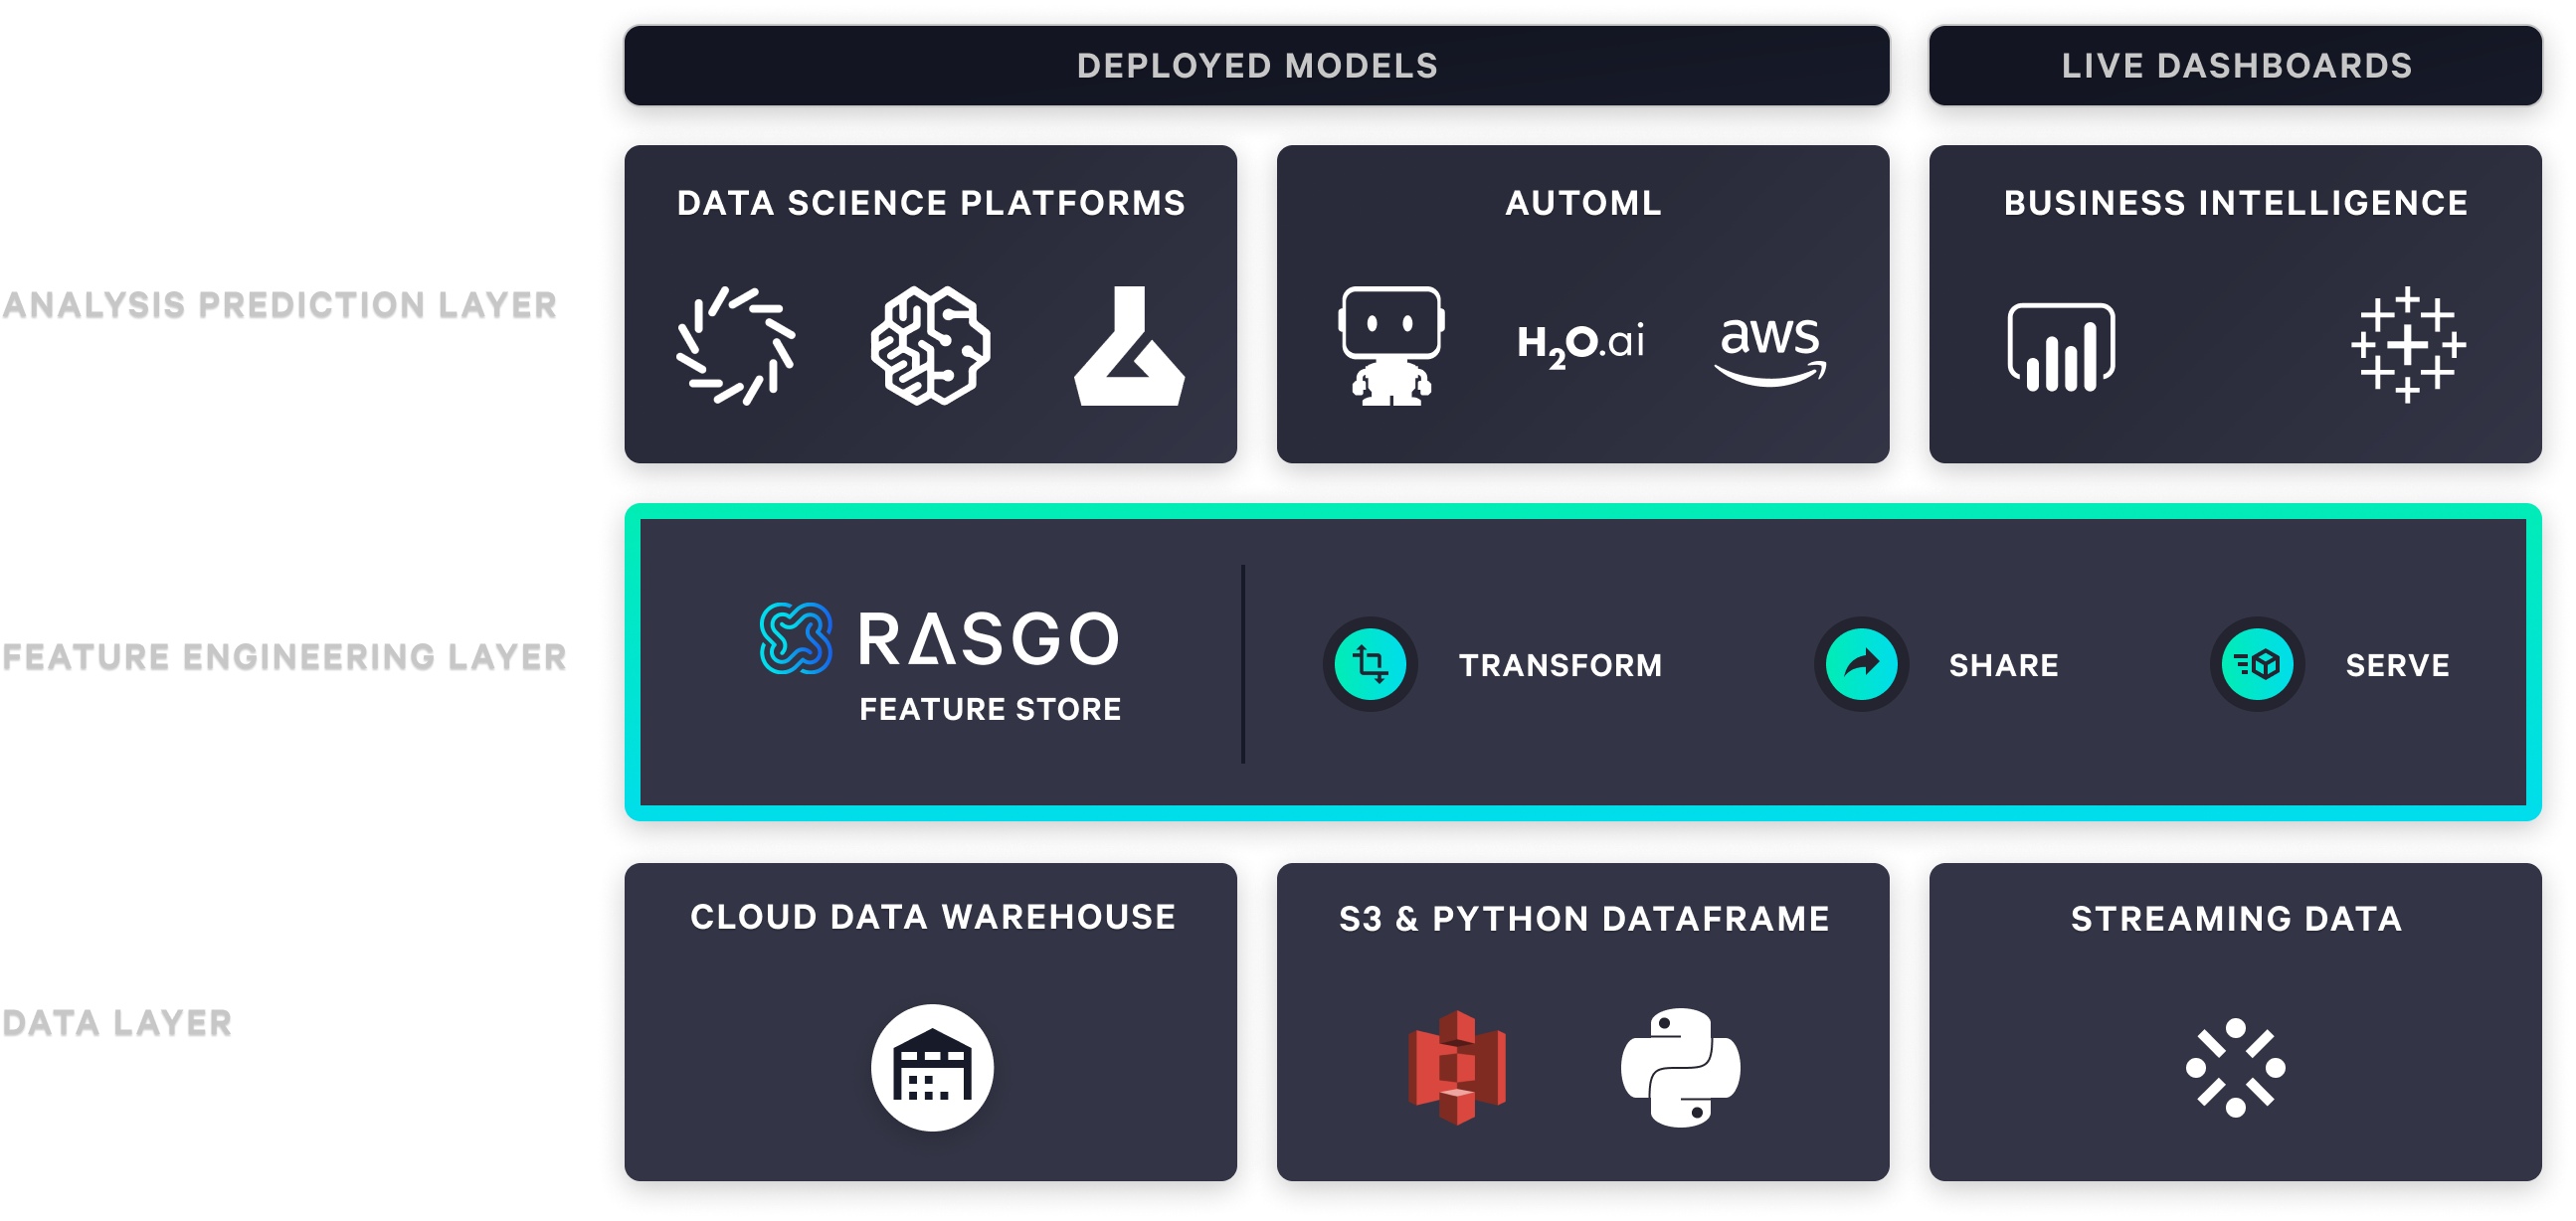 Rasgo Feature Store Overview Diagram